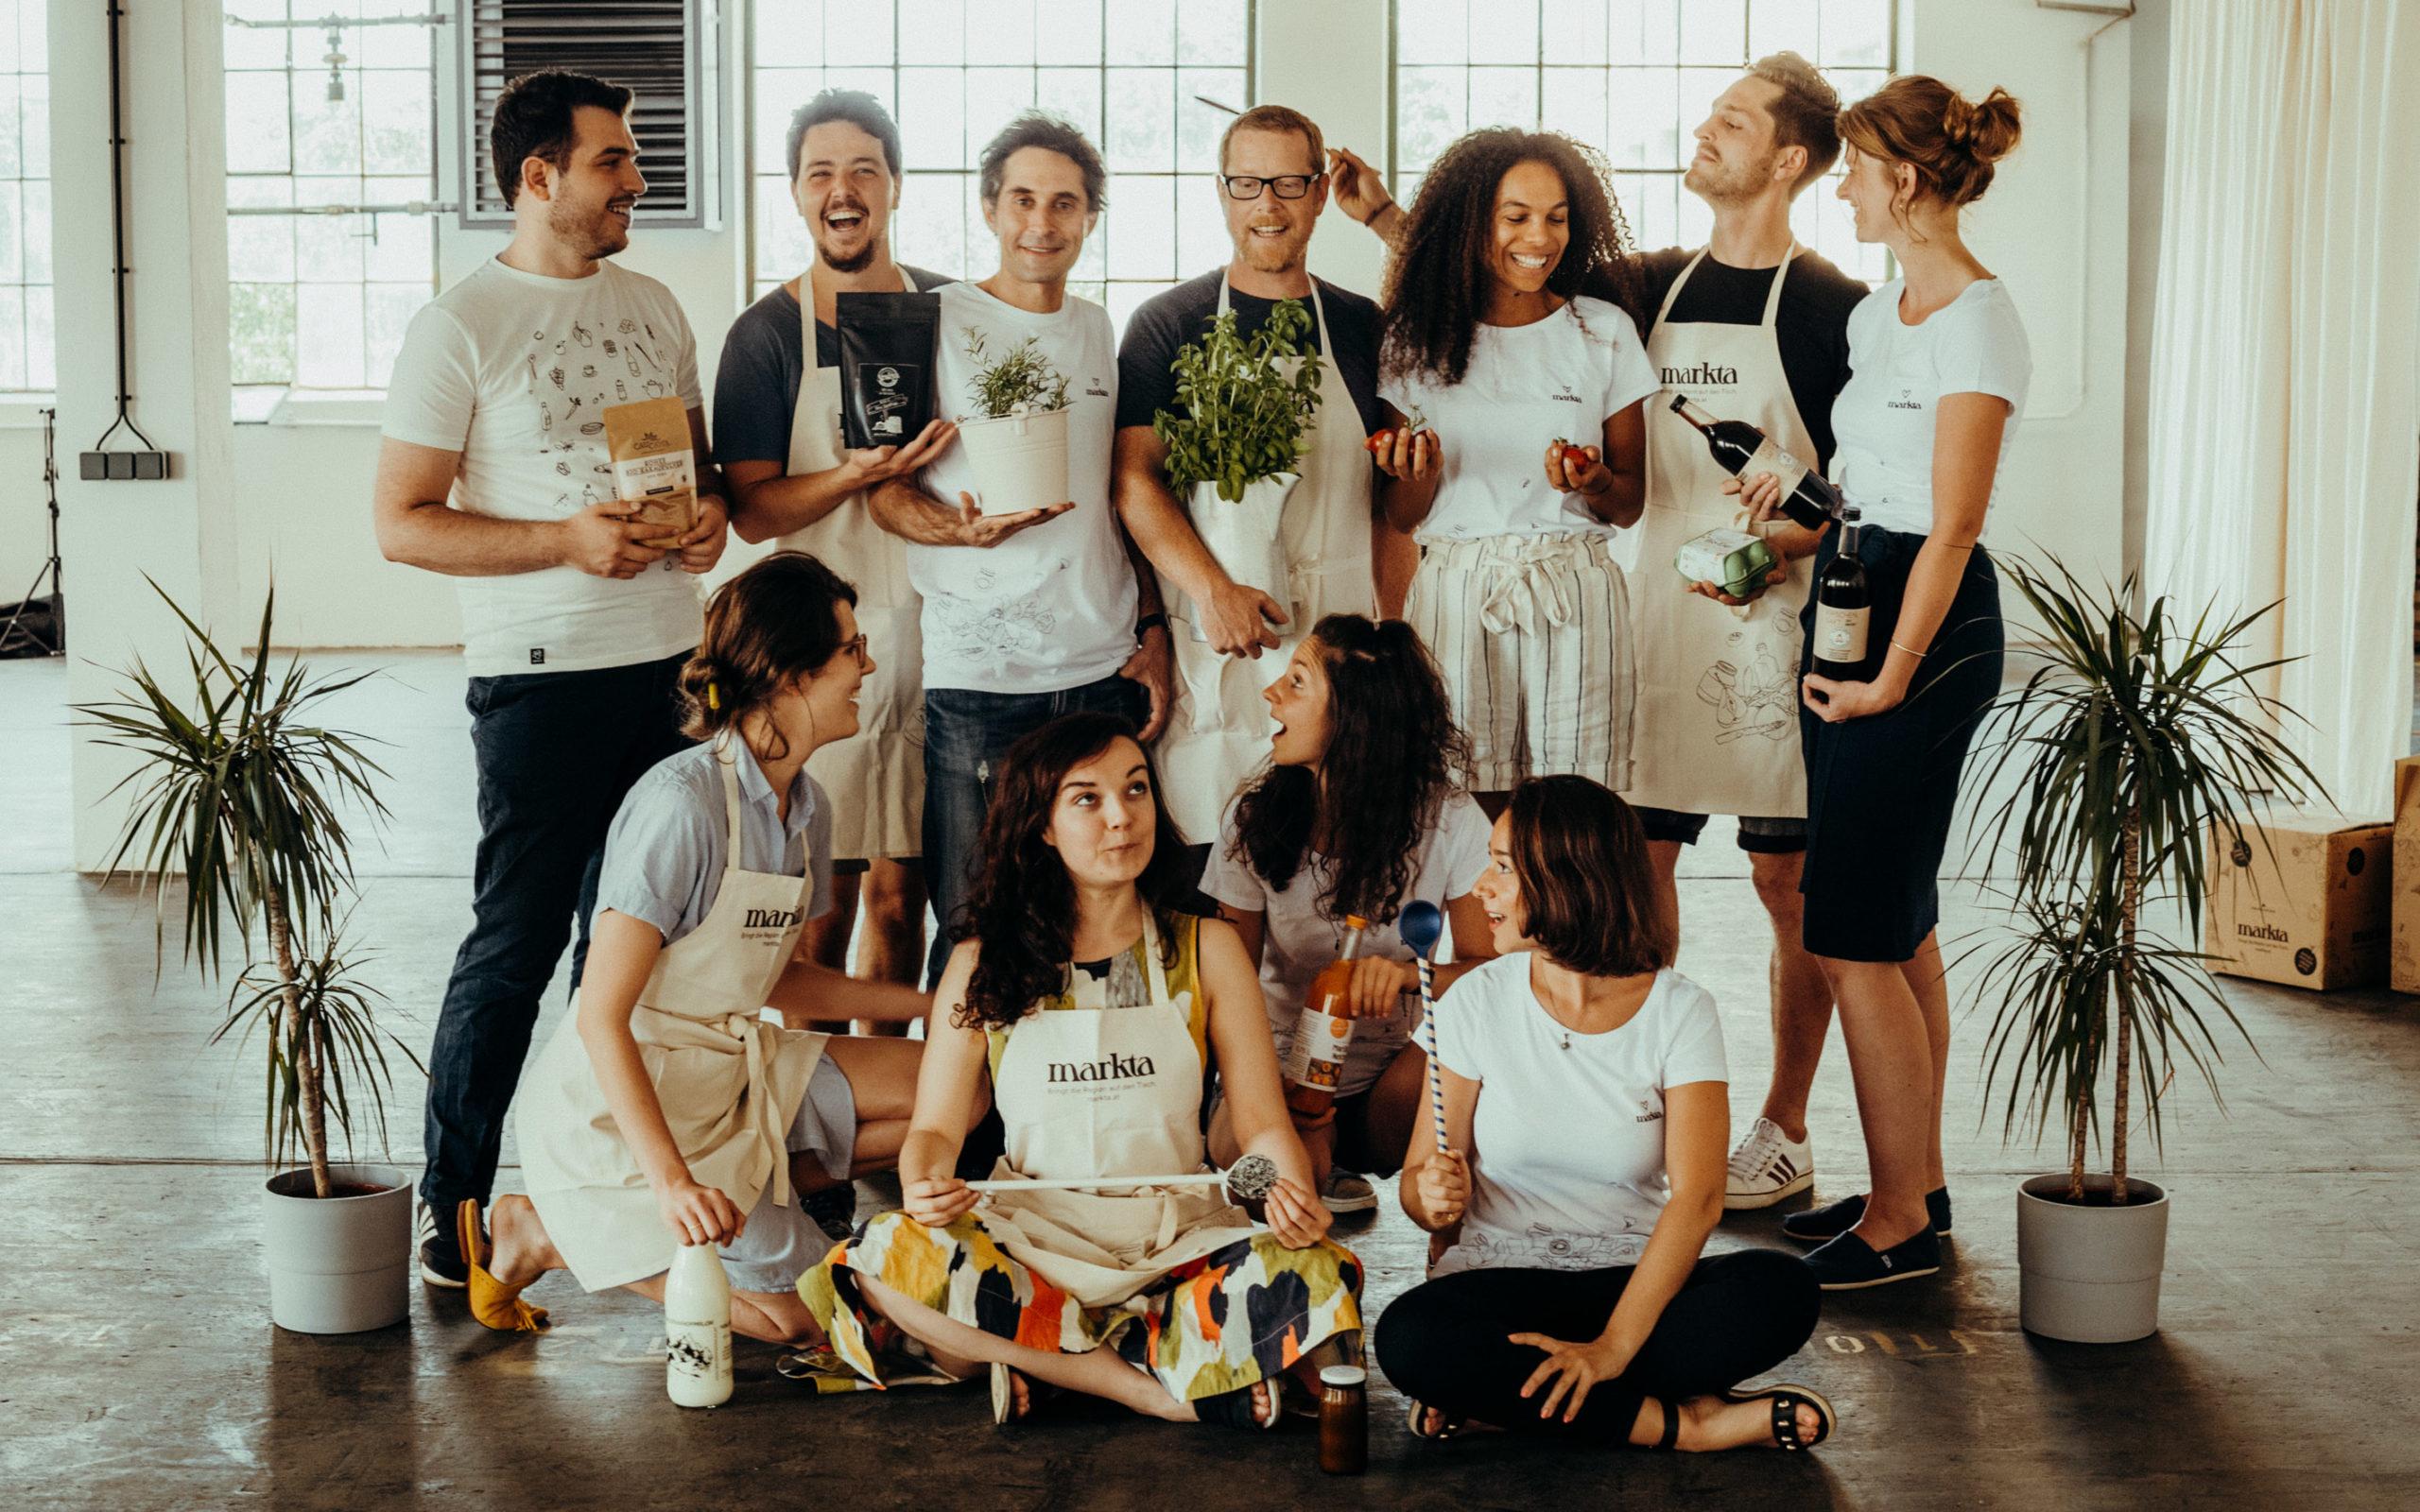 das markta-Team. © JENN AND THE CAMERA // Jennifer Wortham